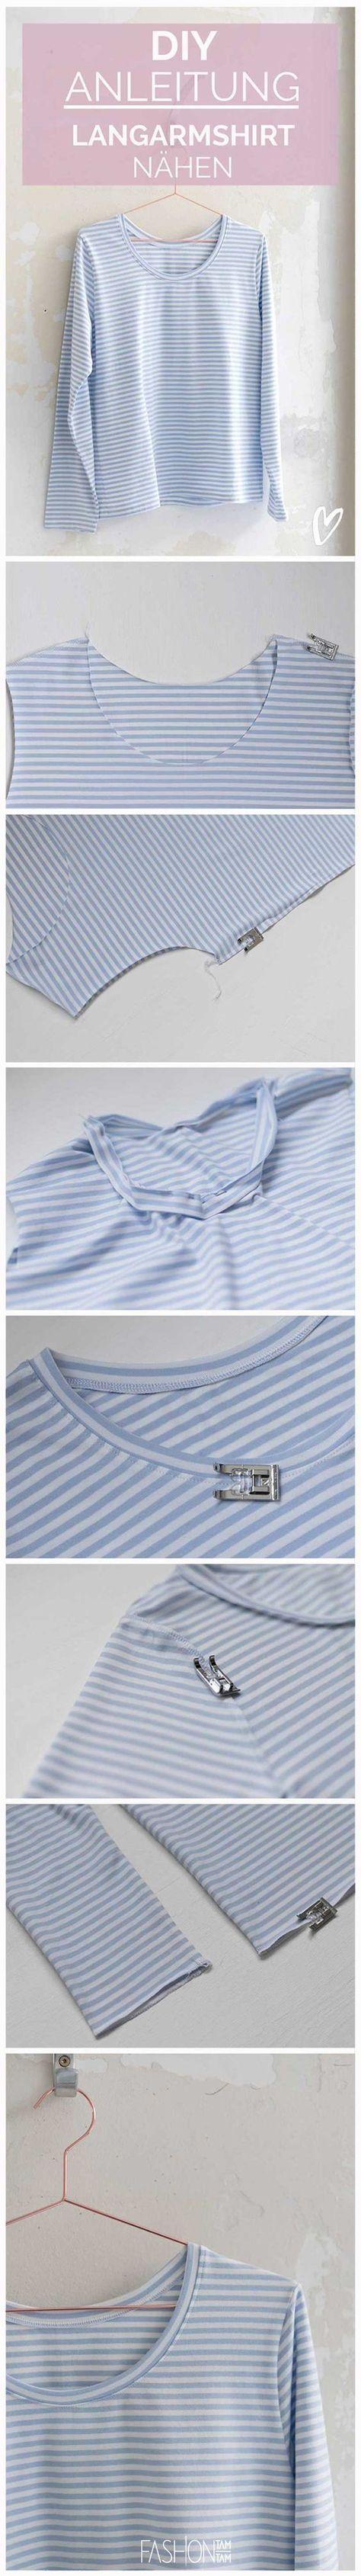 How to Shirt mit langen Ärmeln nähen, Anleitung T-Shirt nähen, Longsleeve nähen, Shirt nähen, Ärmel verarbeiten, Ärmel nähen, T-Shirt mit Streifen nähen, T-Shirt Selbermachen, Streifenhirt annähen, Anleitung Ärmel nähen, T-Shirt mit langen Ärmel nähen, T-Shirt Selbermachen, Ärmel mit nähen, Nähen für Anfänger, Nähen leicht, leicht Nähen, DIY Shirt, Streifenshirt, Streifenhirt nähen, T-Shirt nähen Overlock, DIY Longsleeve #diyshirts